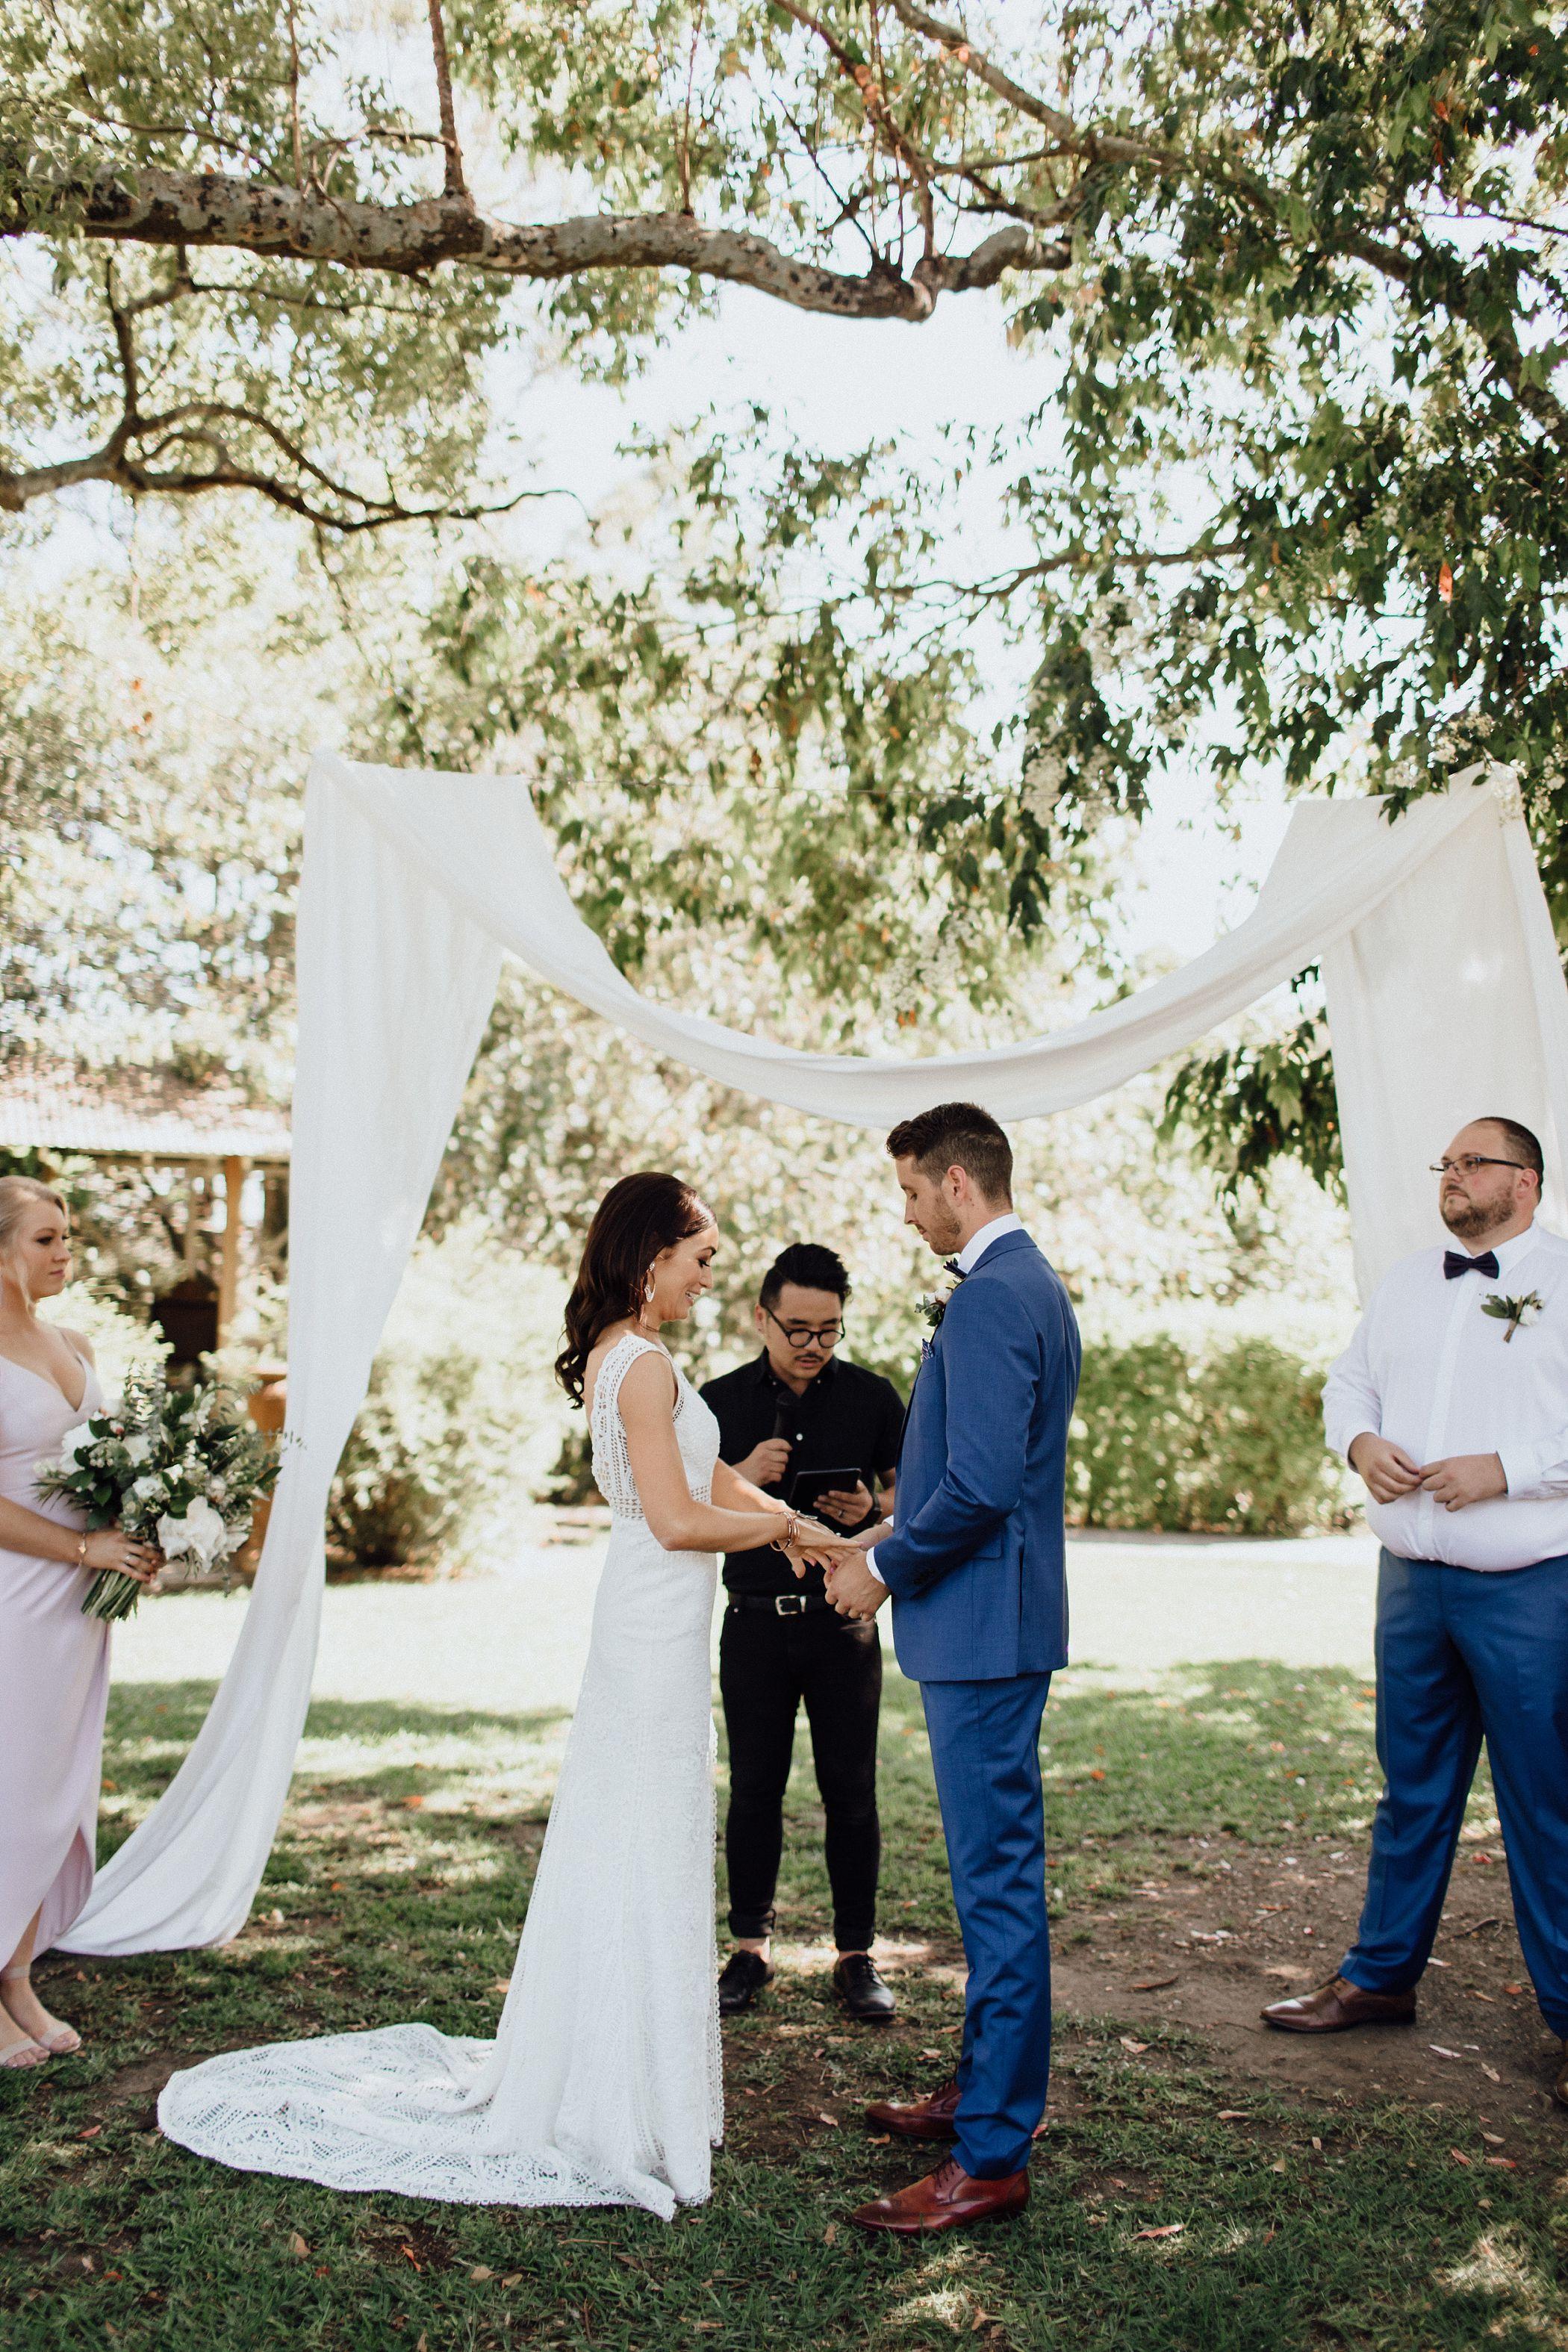 lauren-anne-photography-newcastle-wedding-photographer-mindaribba-house_0025.jpg